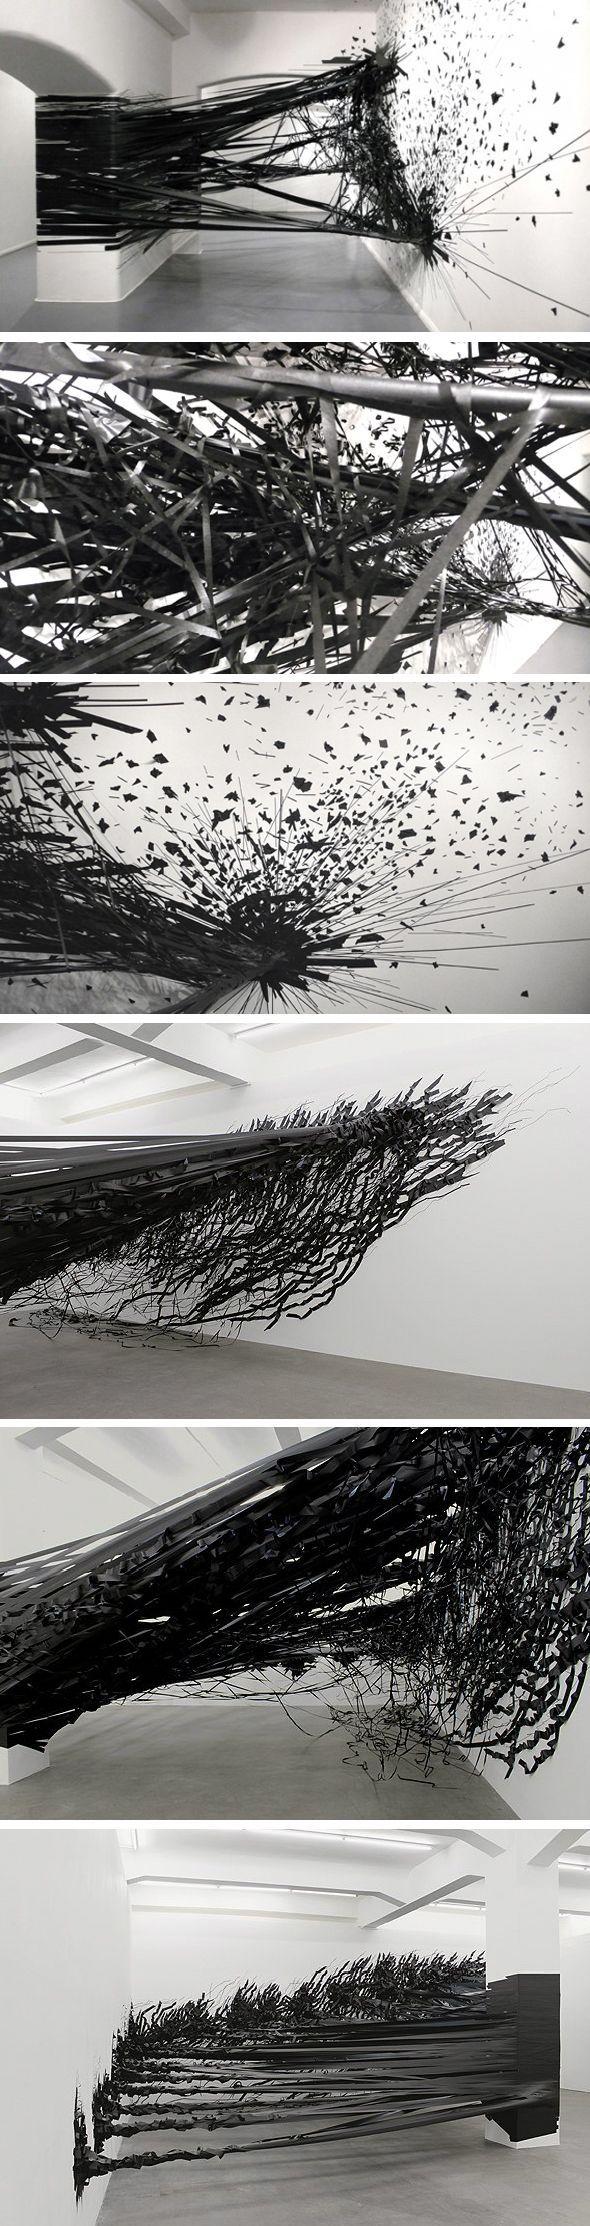 "Art | アート | искусство | Arte | Kunst | Paintings | Installations | ""Aerial"" tape installation by Monika Grzymala"